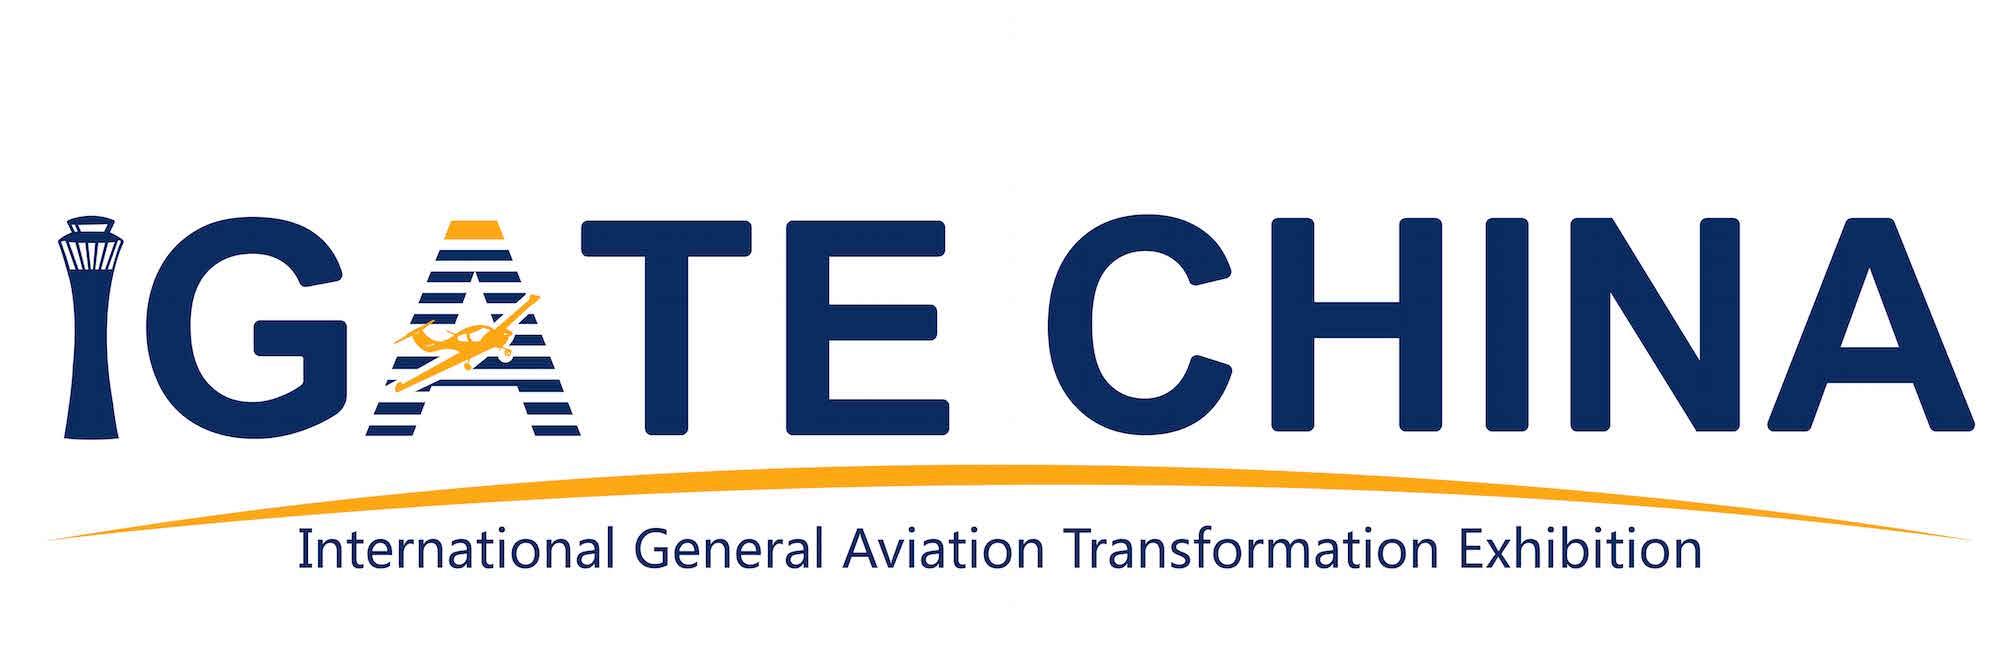 International General Aviation Transformation Exhibition